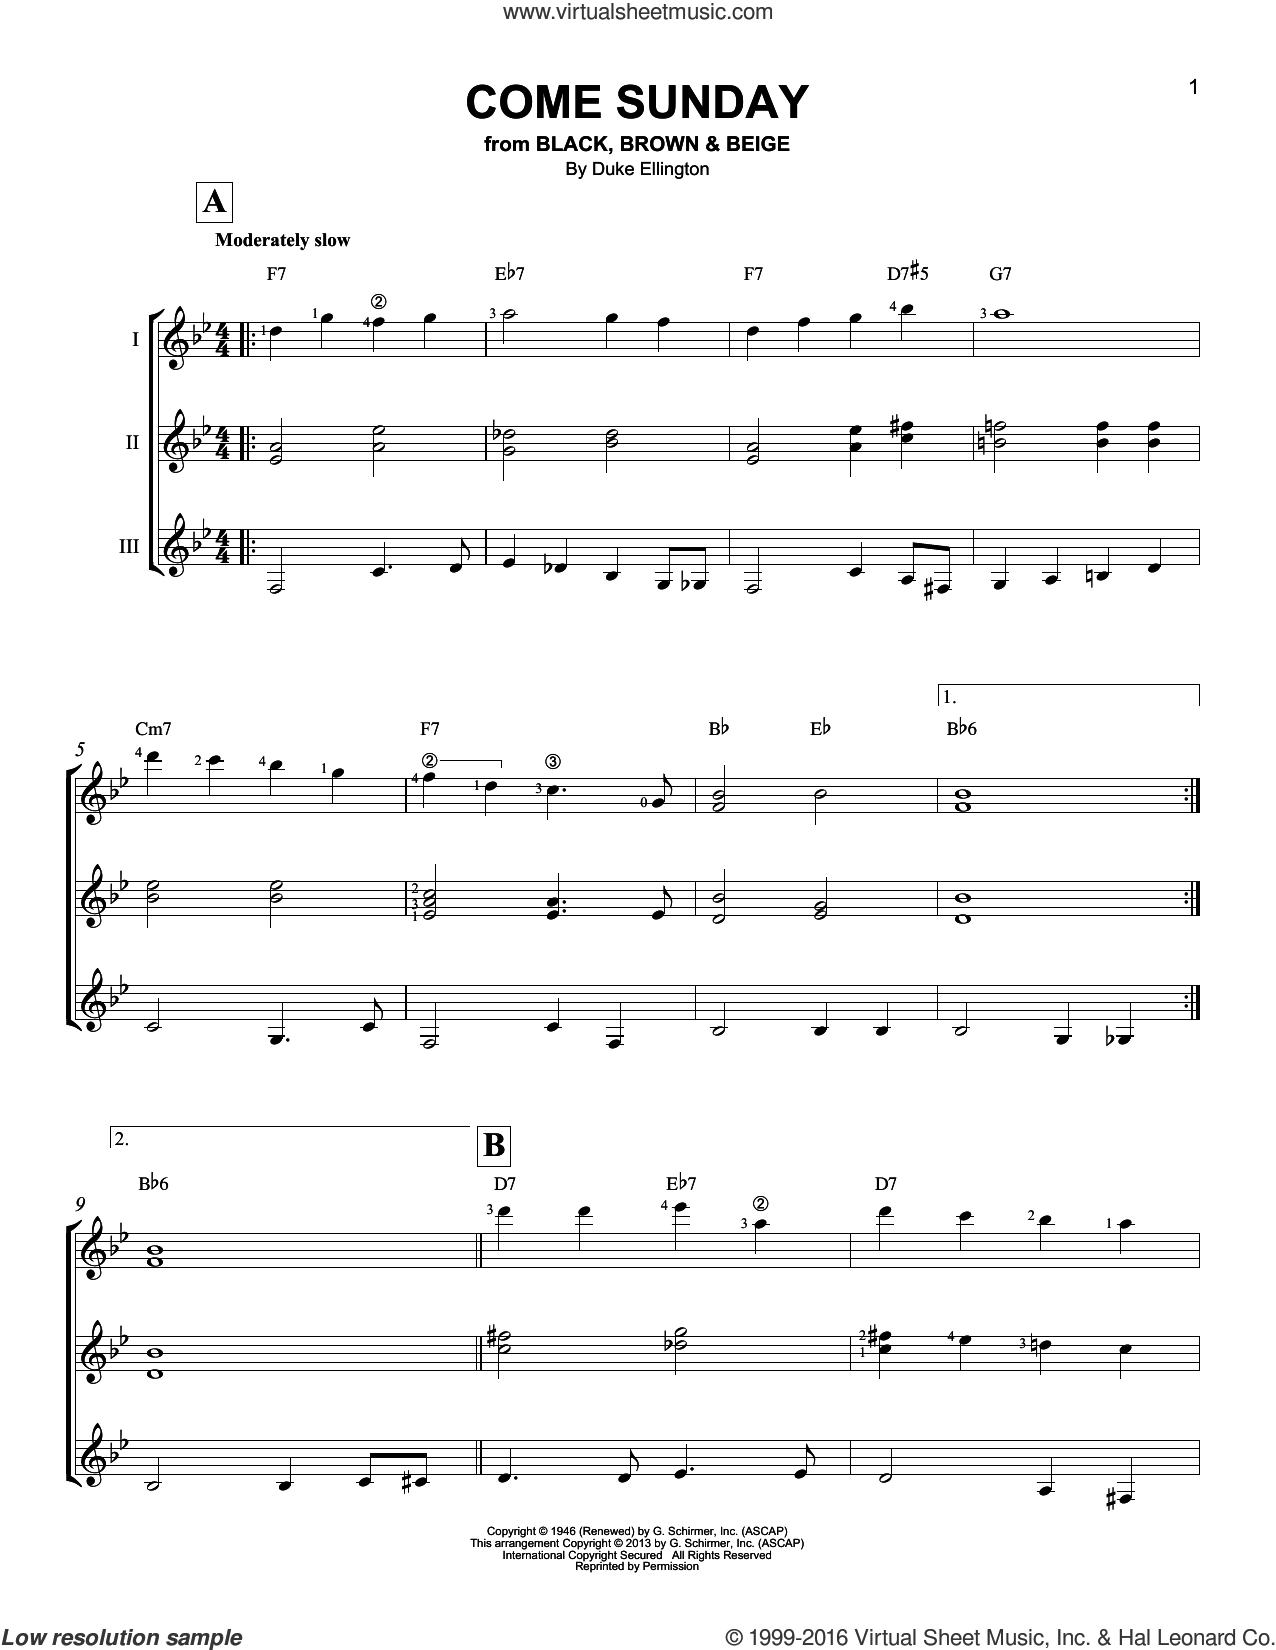 Come Sunday sheet music for guitar ensemble by Duke Ellington, intermediate skill level